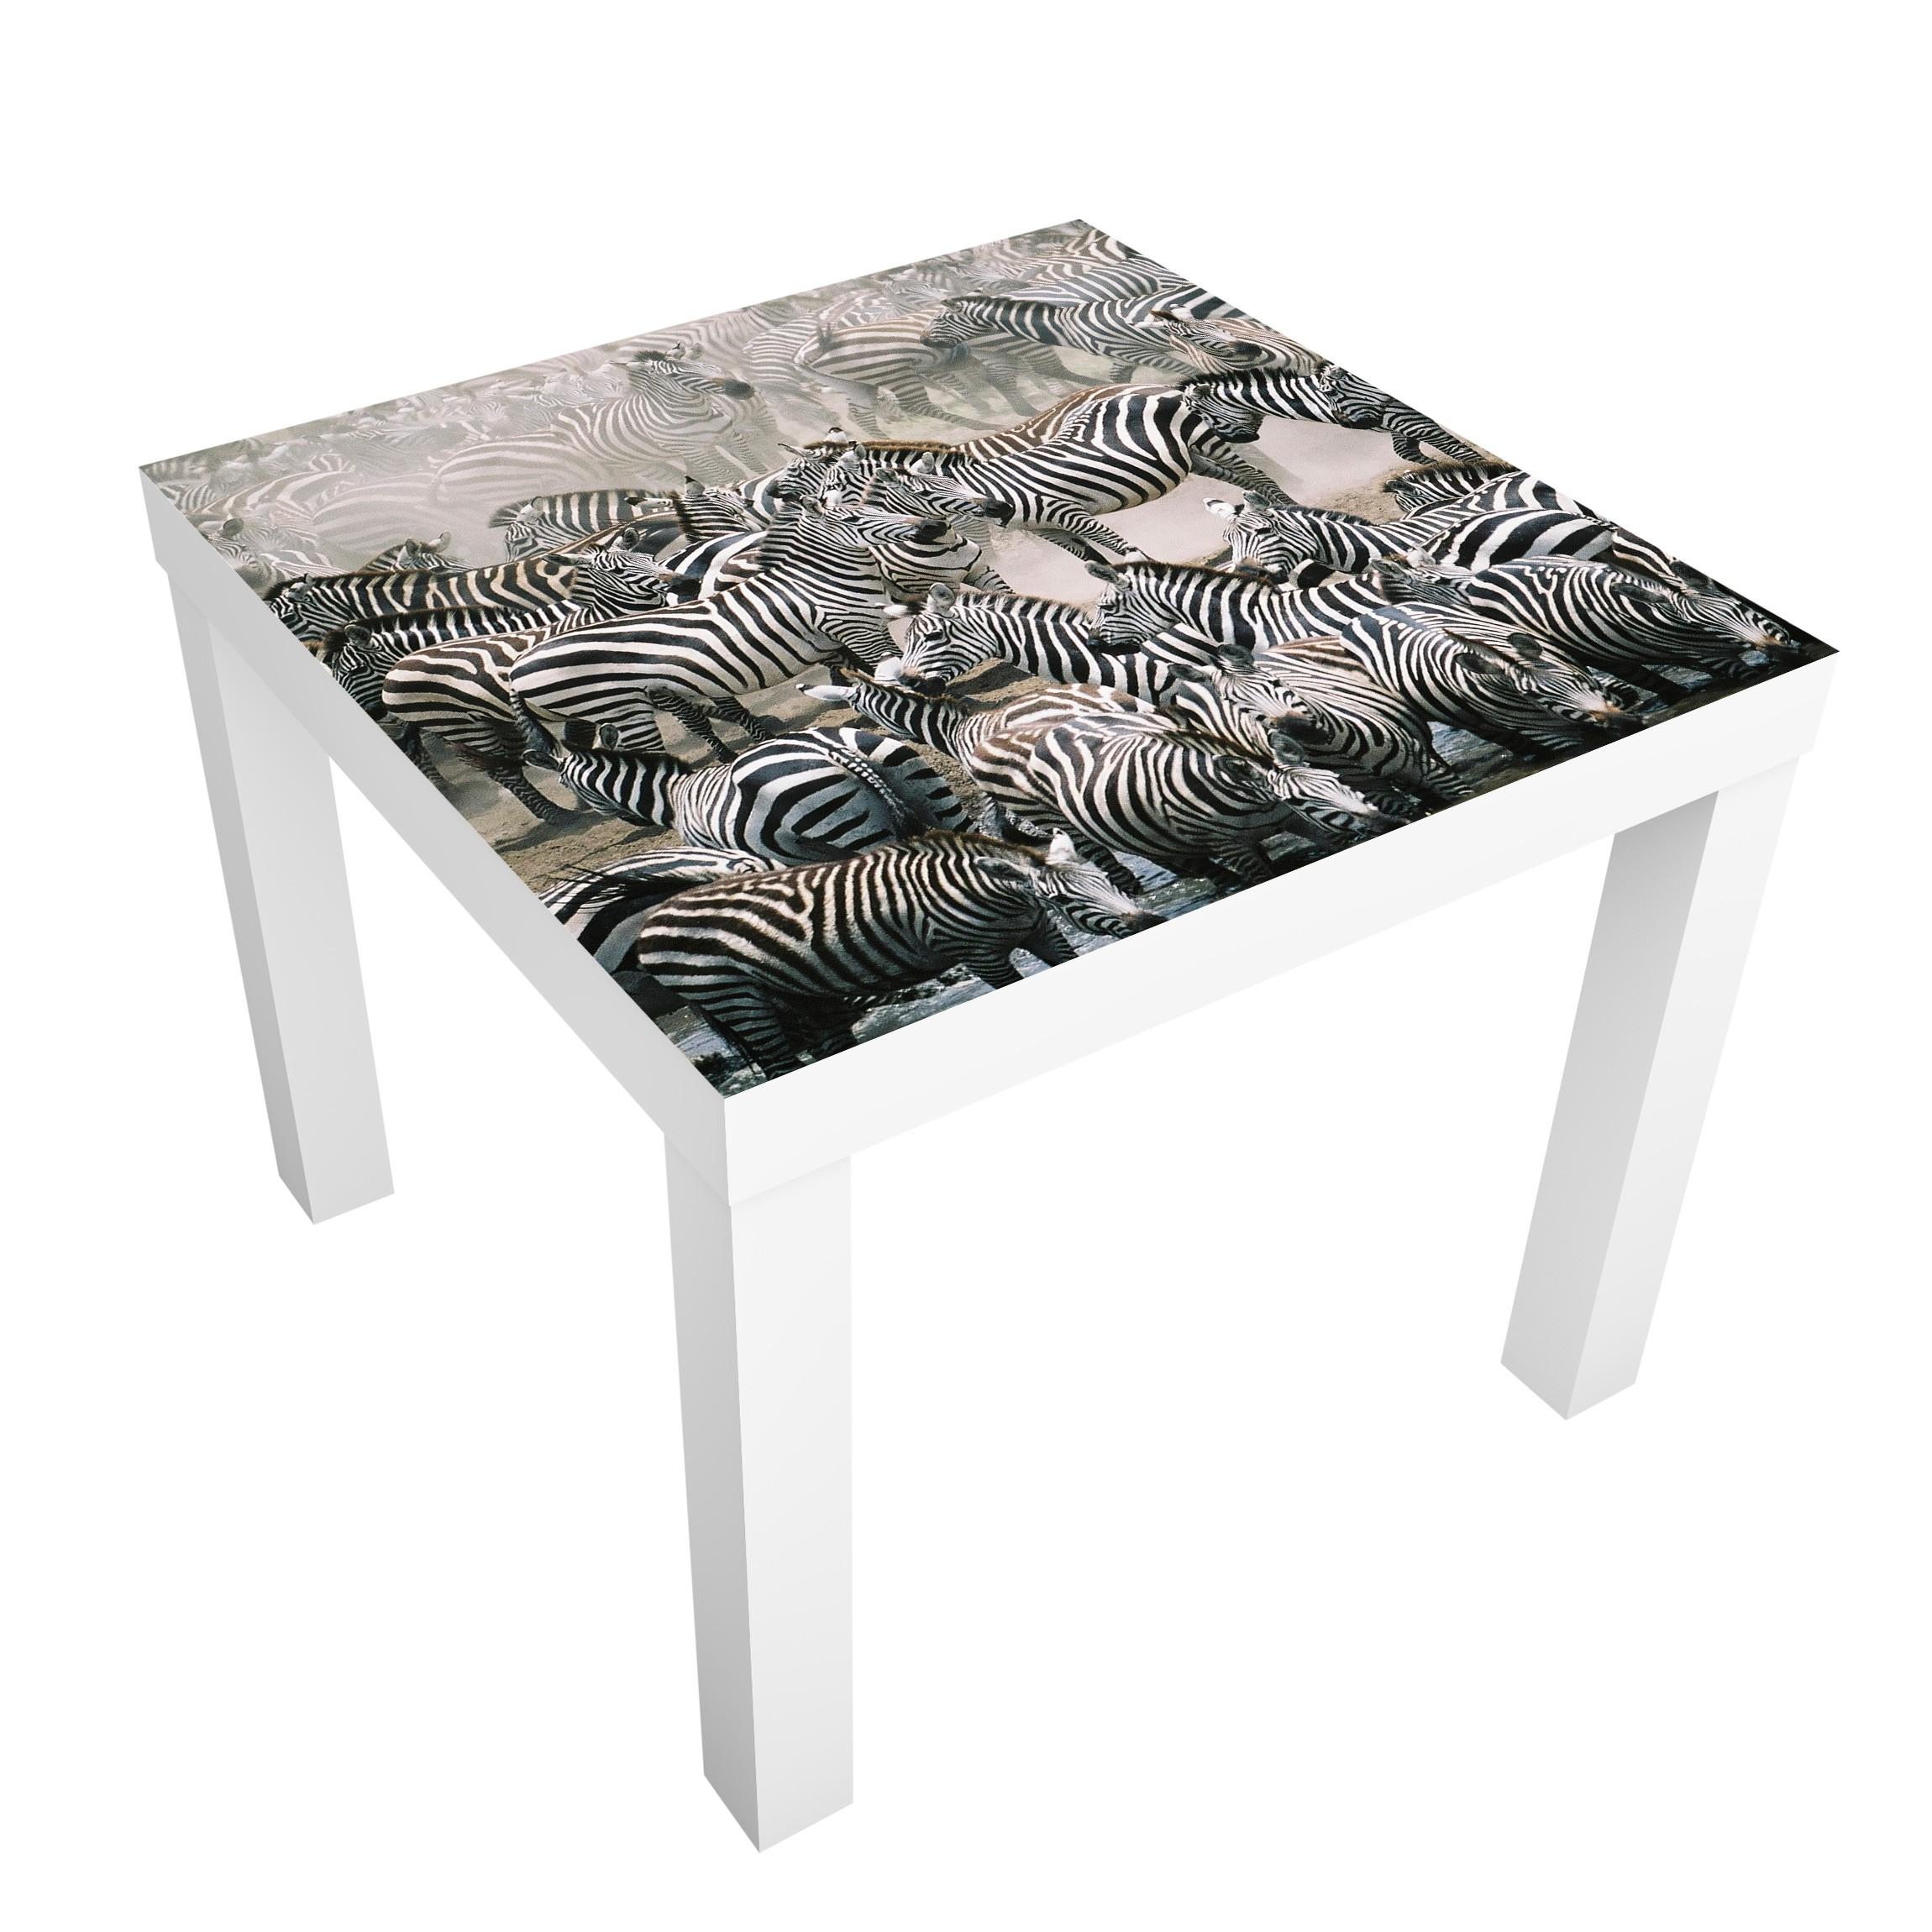 Carta adesiva per mobili ikea lack tavolino zebra herd - Lack tavolino ikea ...